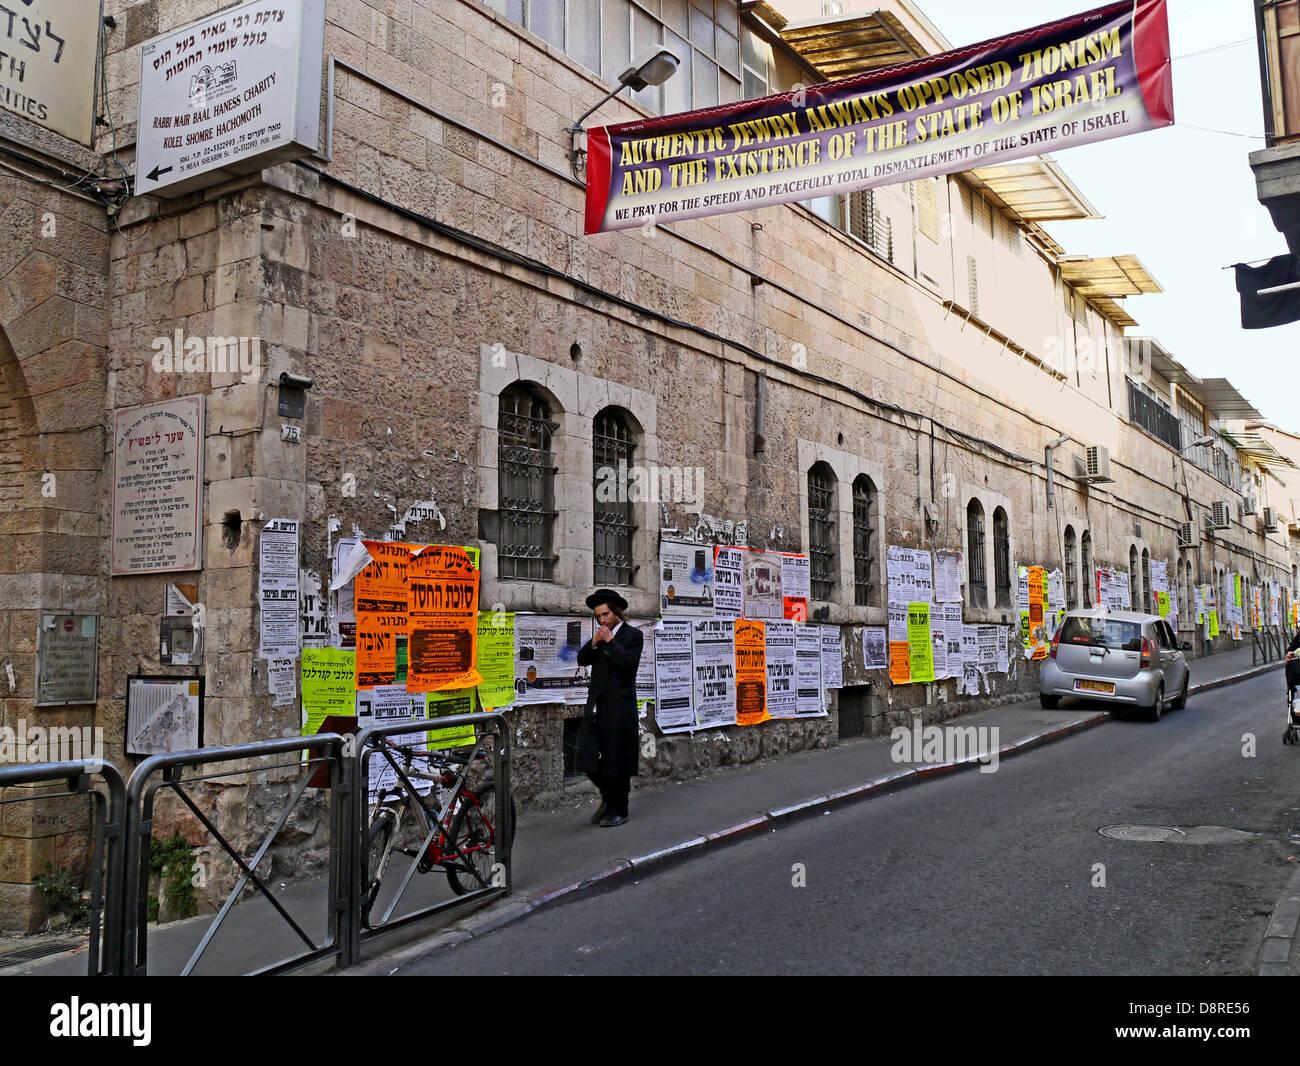 Anti-Zionist banner in Meah Shearim Jerusalem - Stock Image